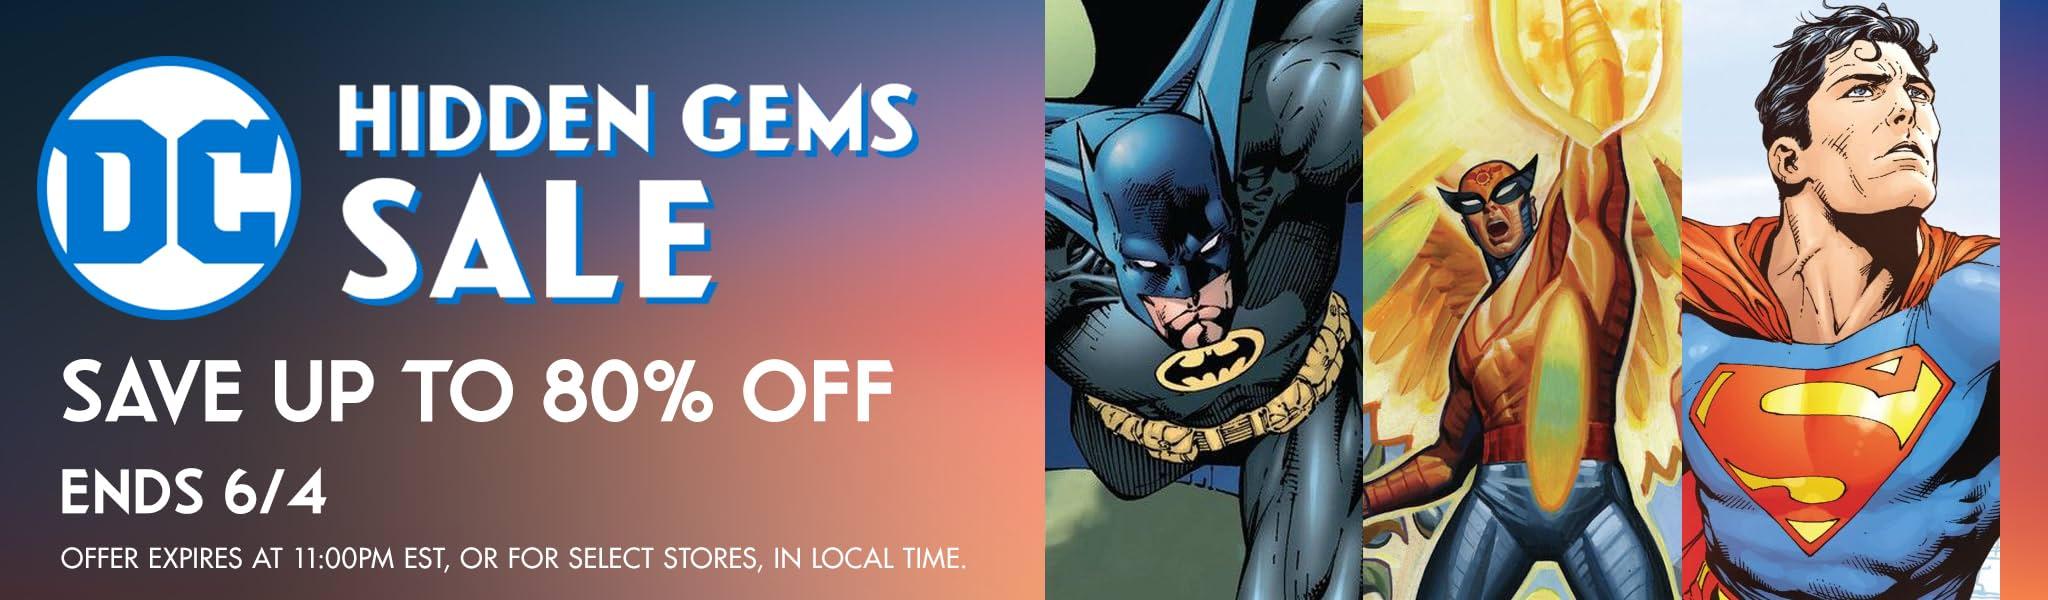 #50 Legion of Super-Heroes Vol 4 1989-2000